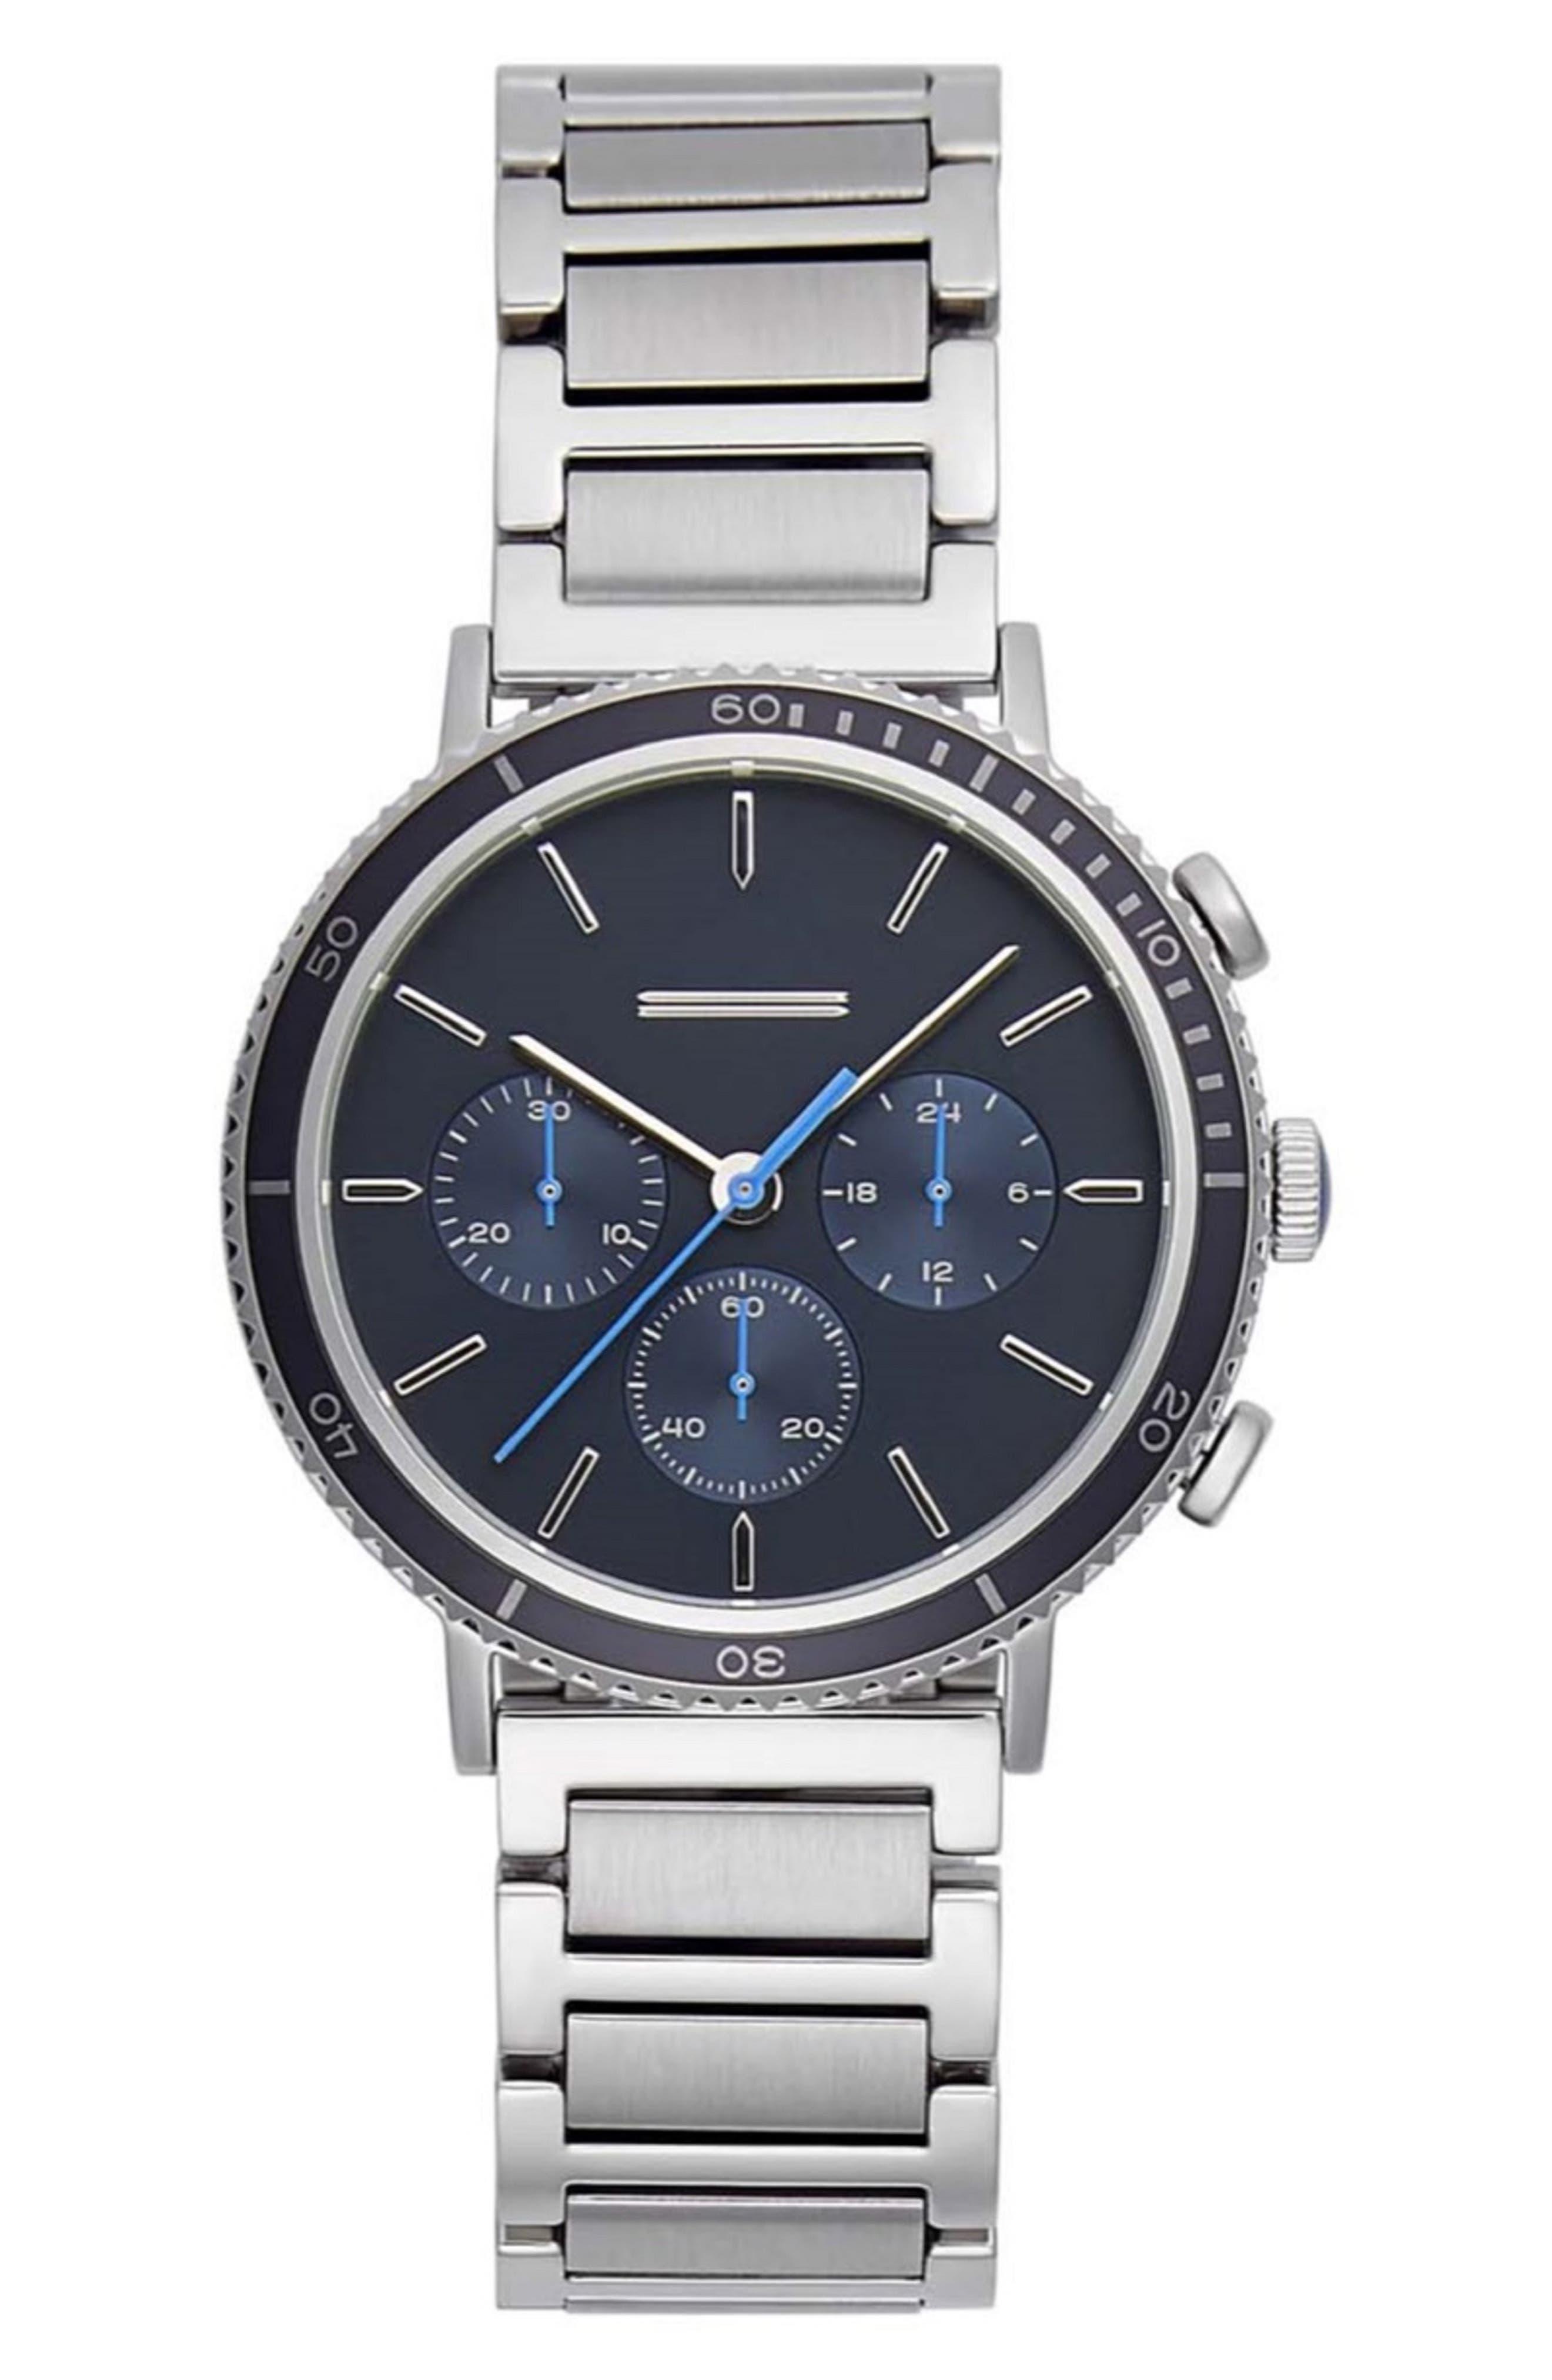 URI MINKOFF Griffith Chronograph Bracelet Watch, 43Mm in Silver/ Blue